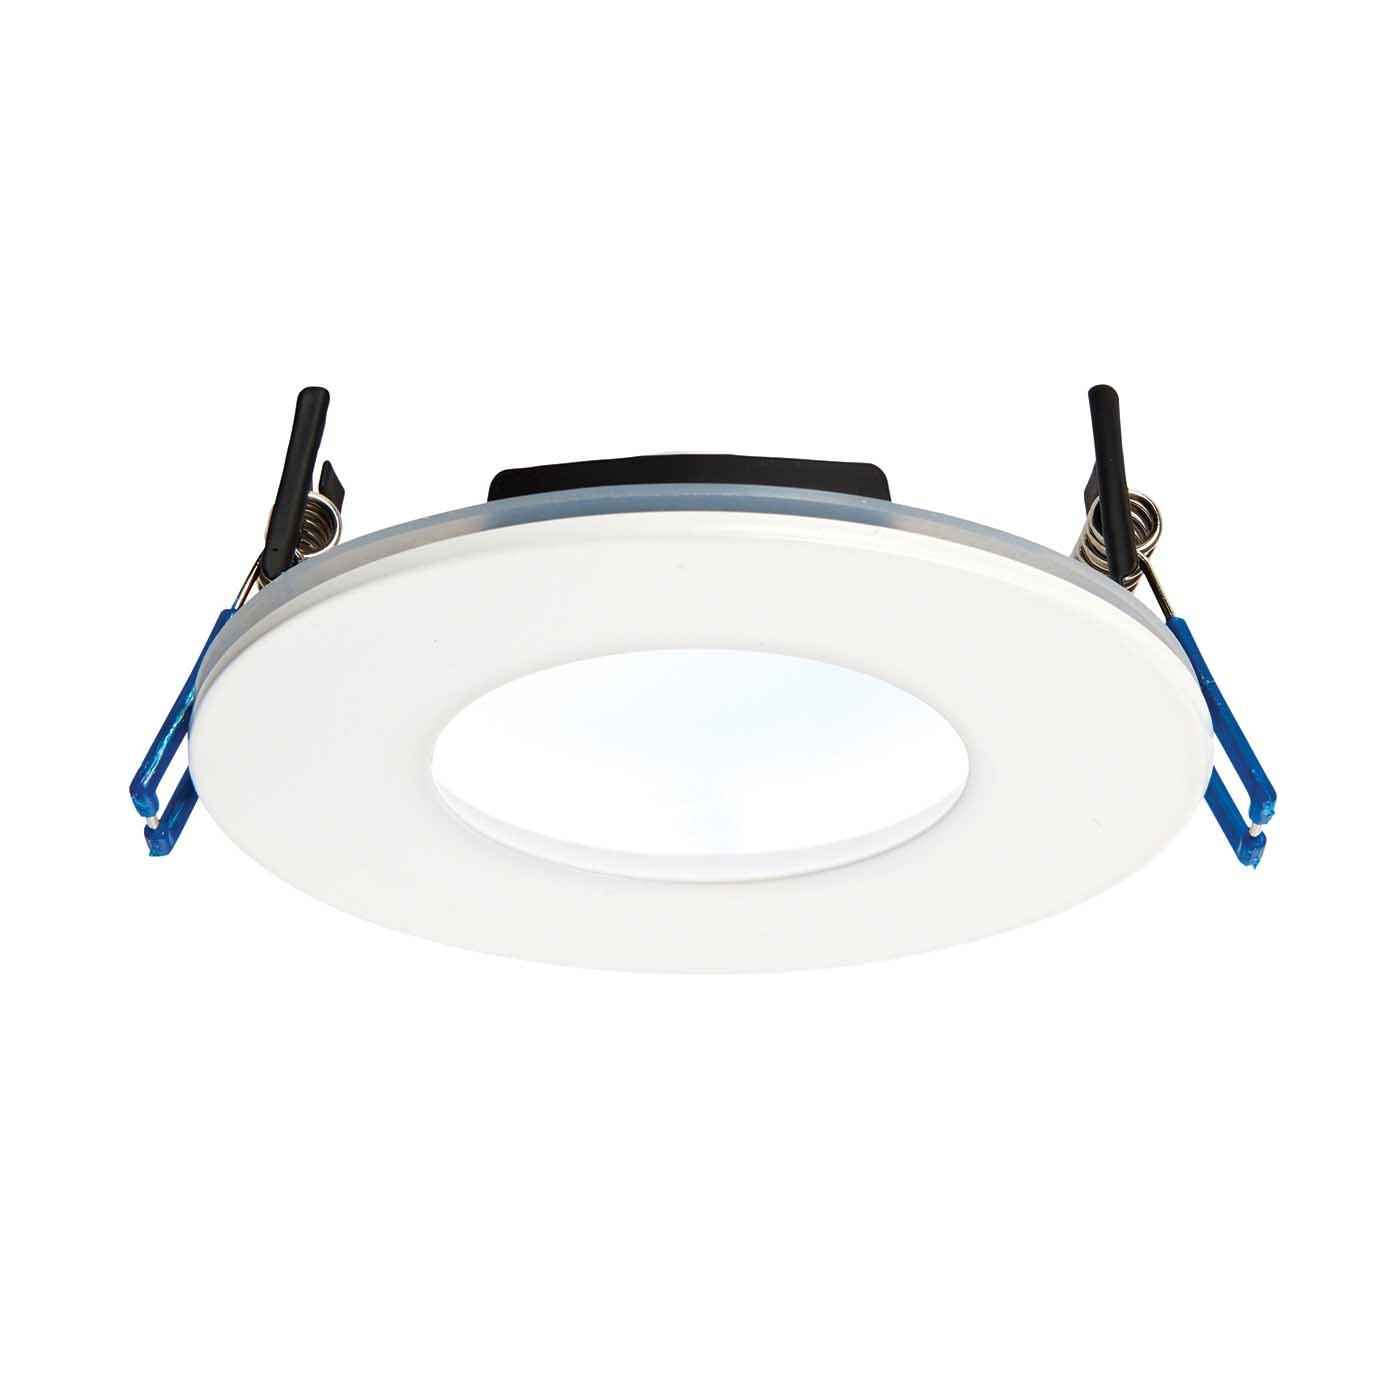 Saxby Orbitalplus Bathroom Recessed Fixed Light Ip65 9w